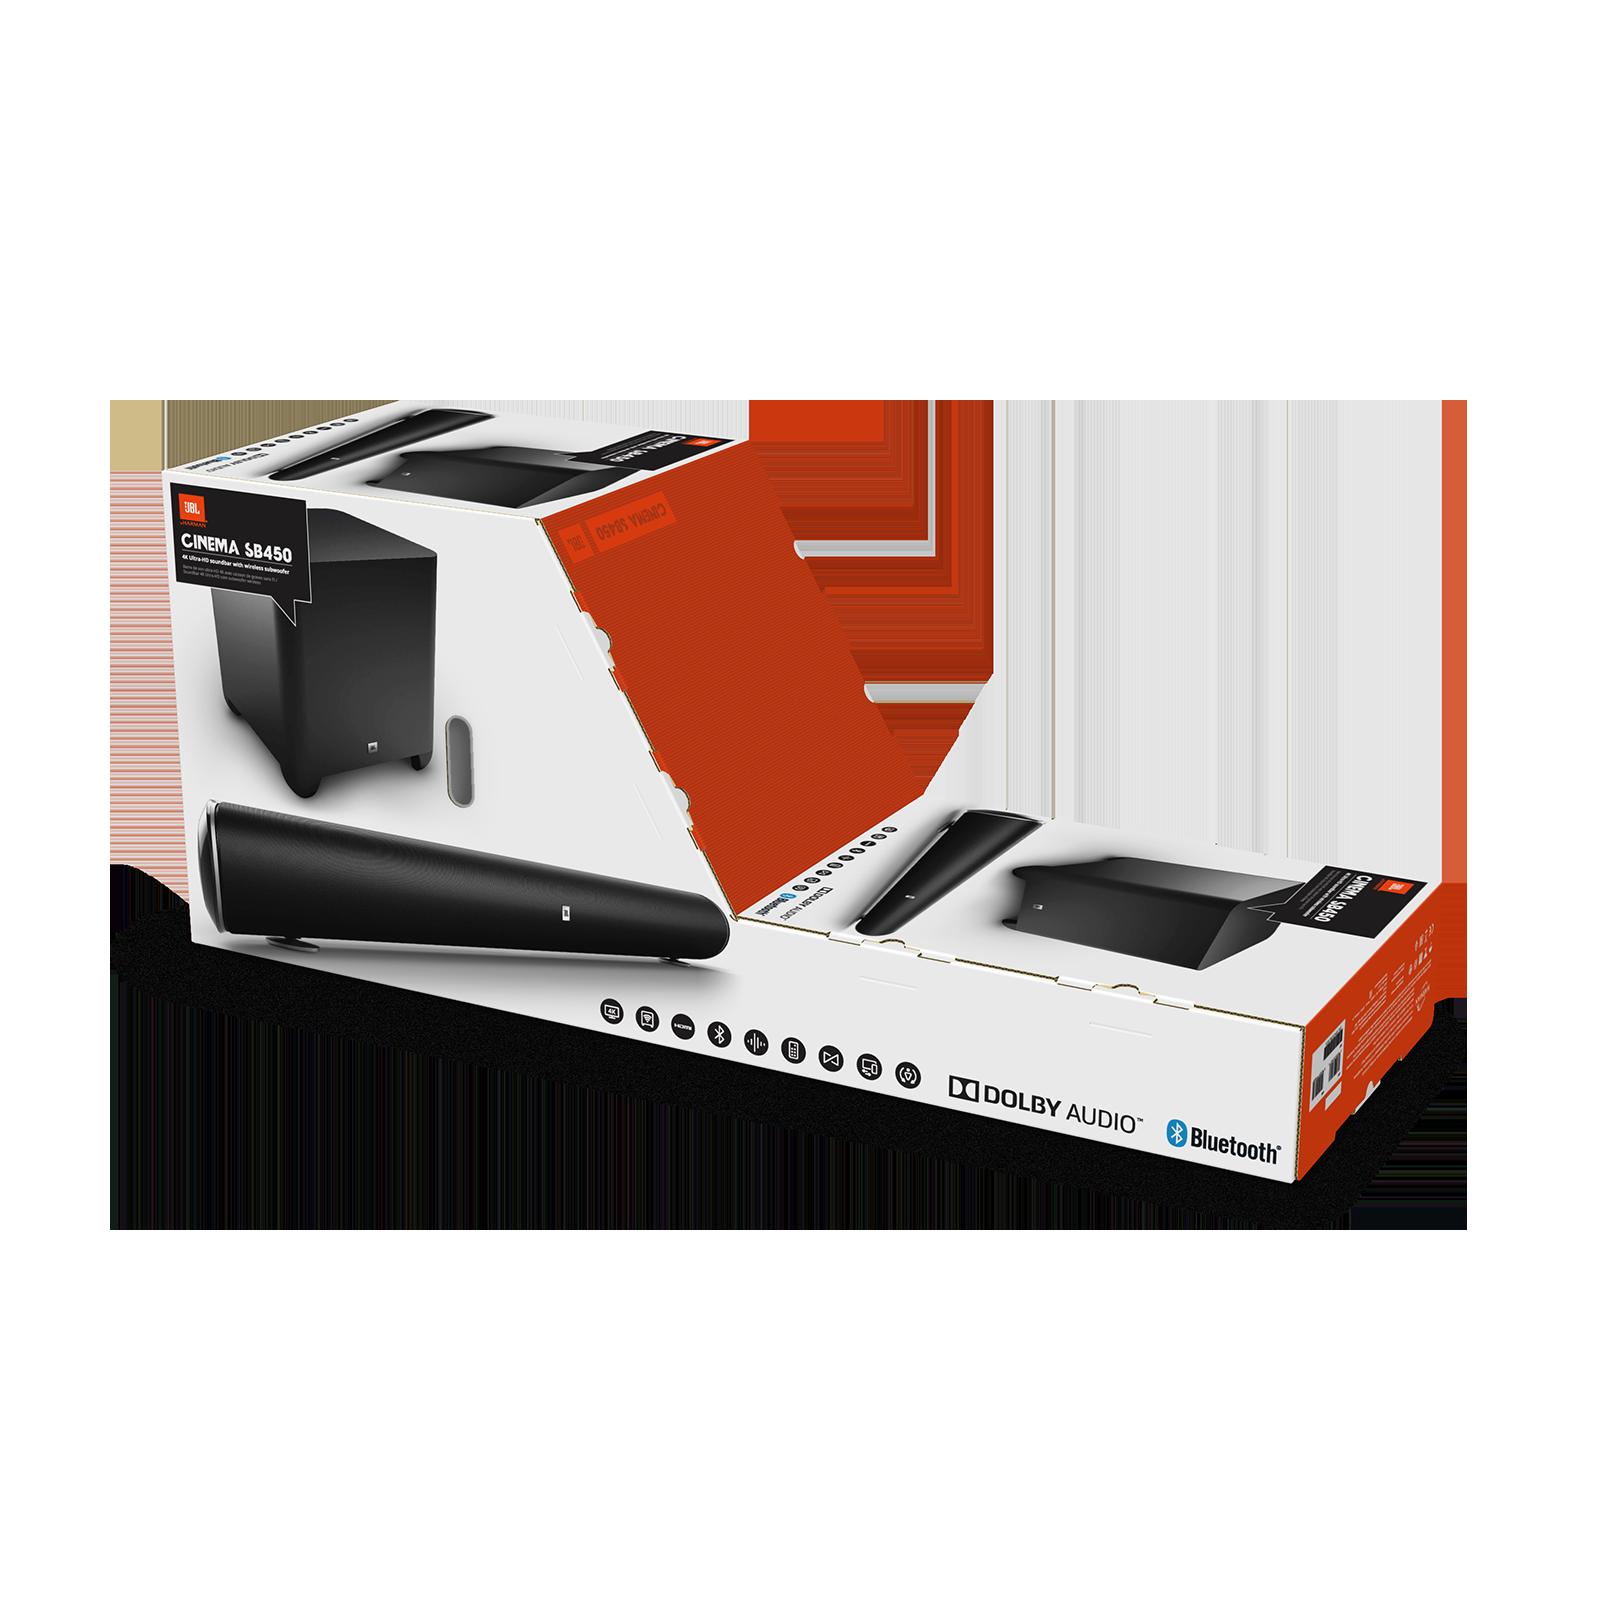 Image result for jbl cinema sb450 4k ultra-hd wireless sound bar with wireless subwoofer (black)